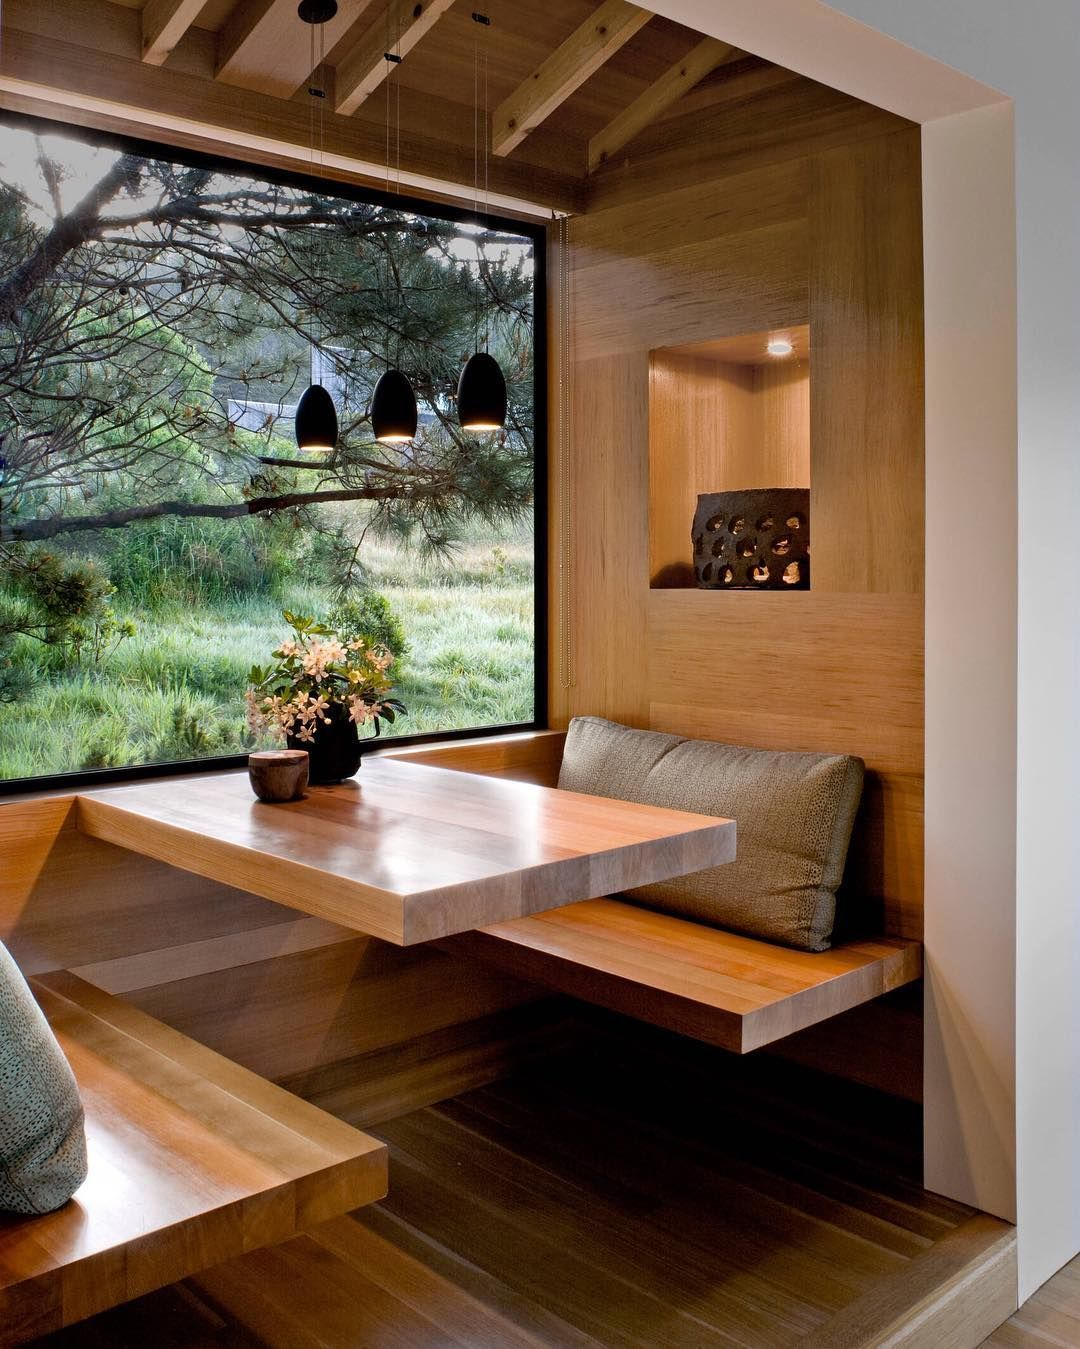 Dining Room Corner Decorating Ideas Space Saving Solutions: 12 Modern Japanese Interior Style Ideas